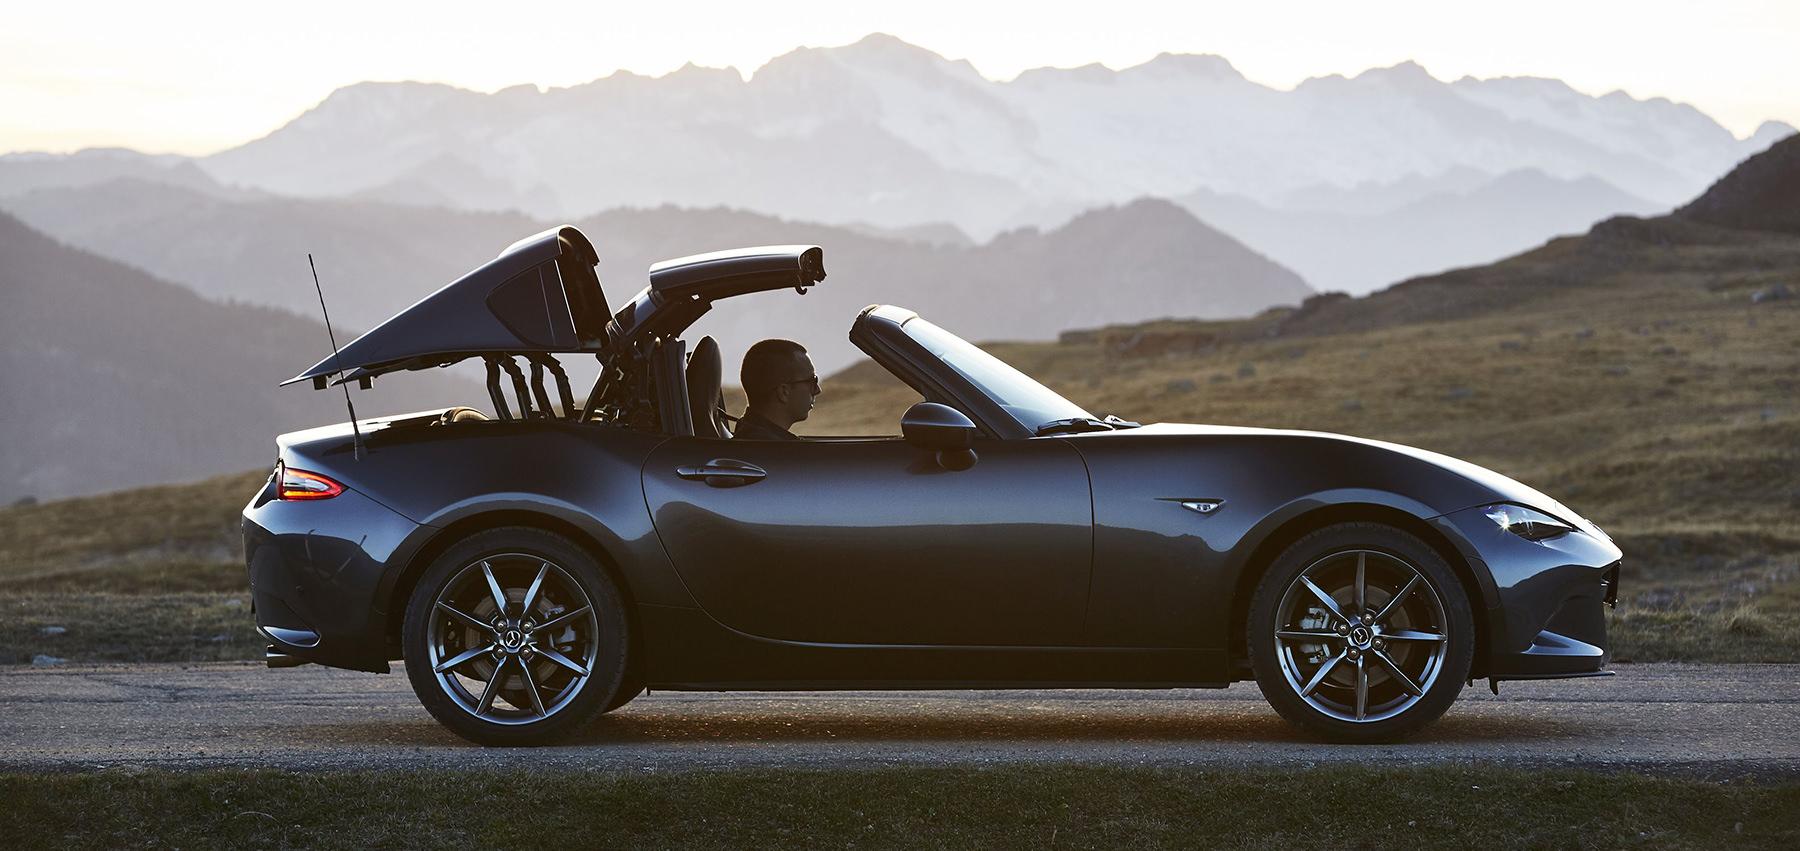 Mazda MX-5 RF   Hardtop Convertible   Mazda UK